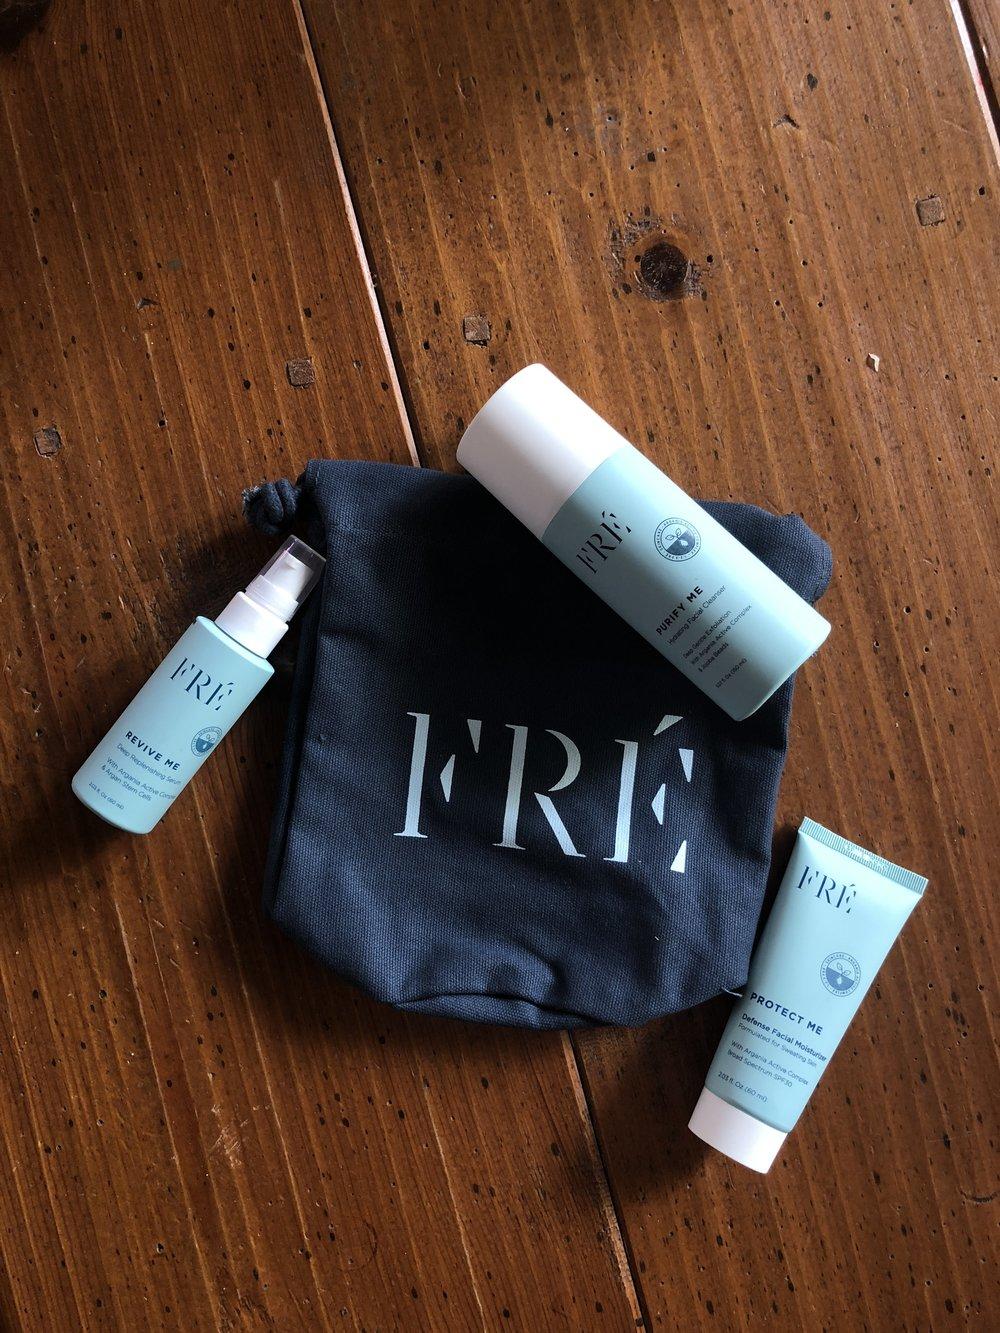 Fre Skincare Set.JPG